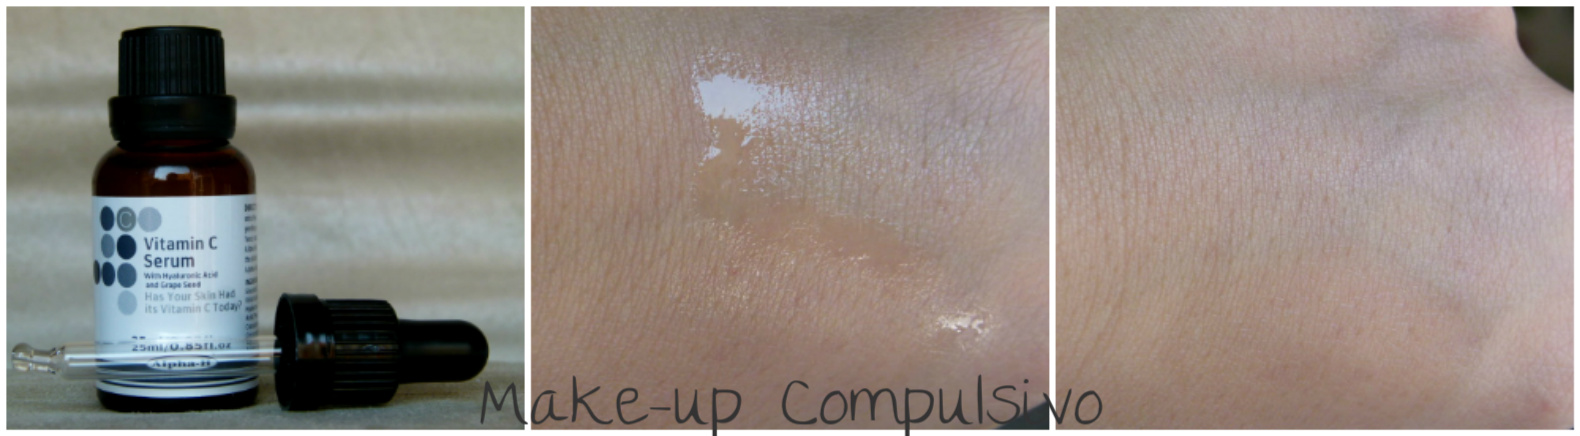 Alpha-h skincare: Vitamin C Serum, Daily essential moisturizer, Age Delay cleansing oil